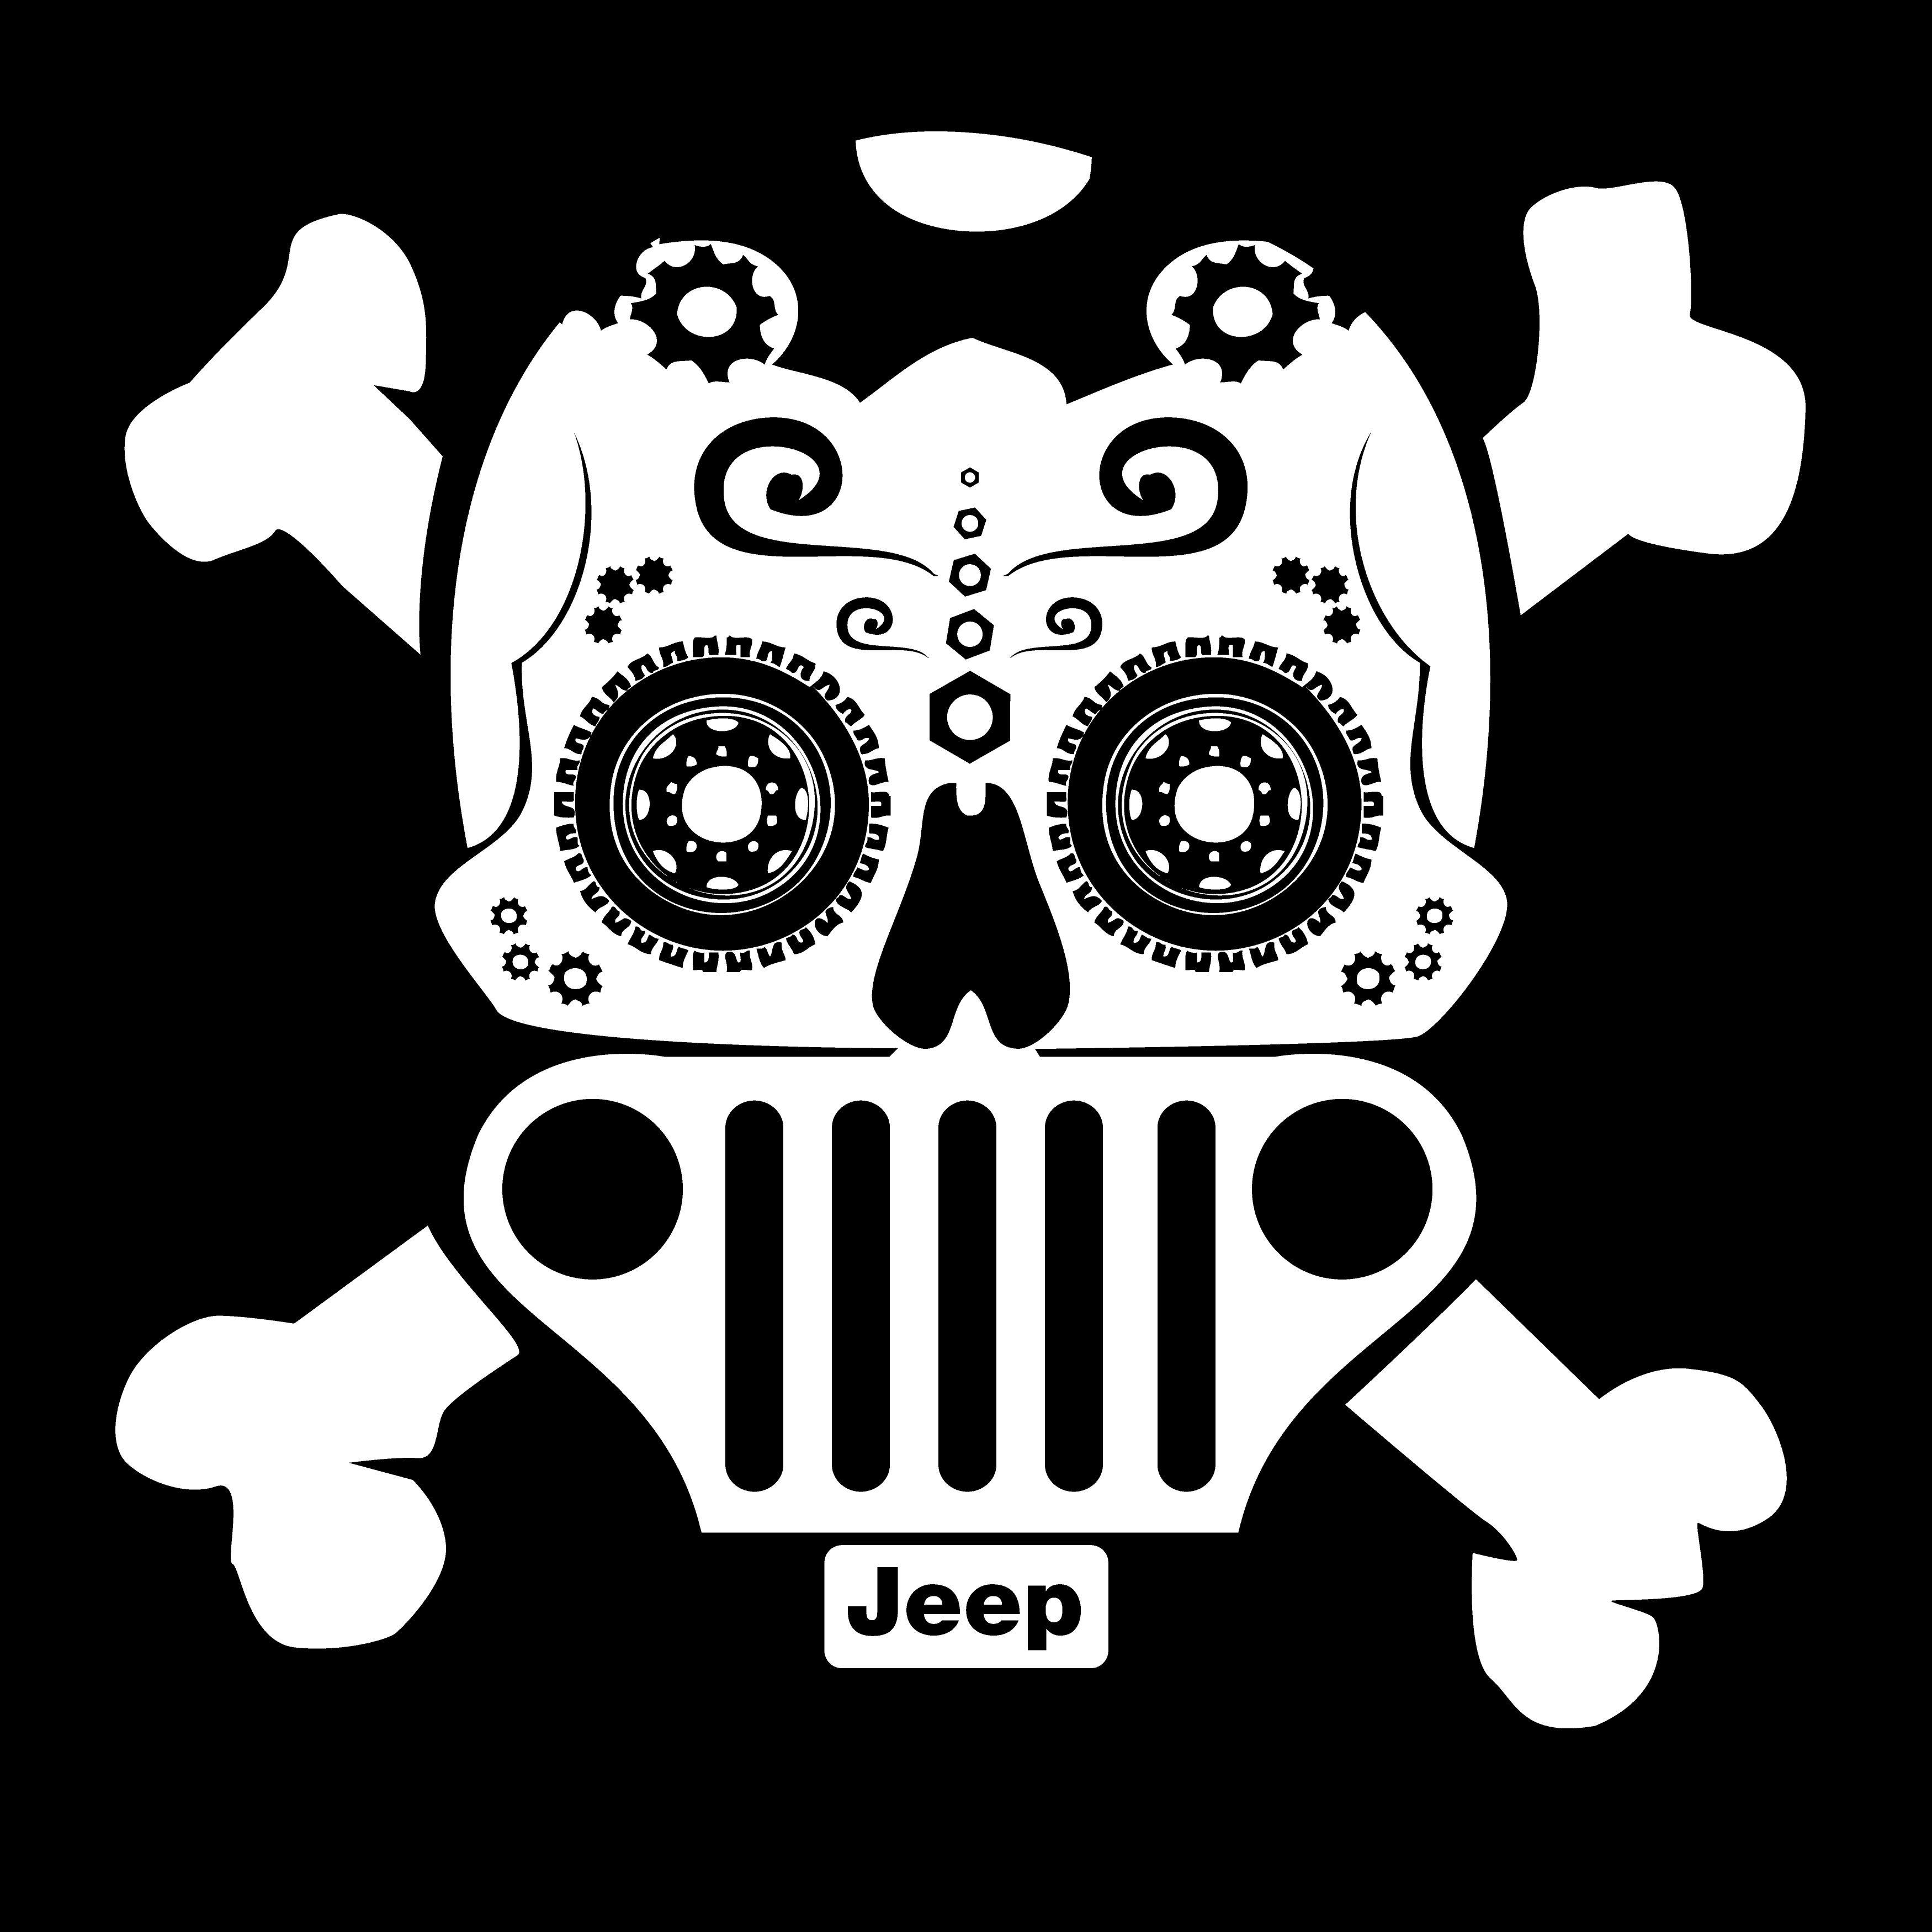 Jeep Themed Sugar Skull Jeep Stickers Jeep Wrangler Accessories Decals Jeep Tattoo